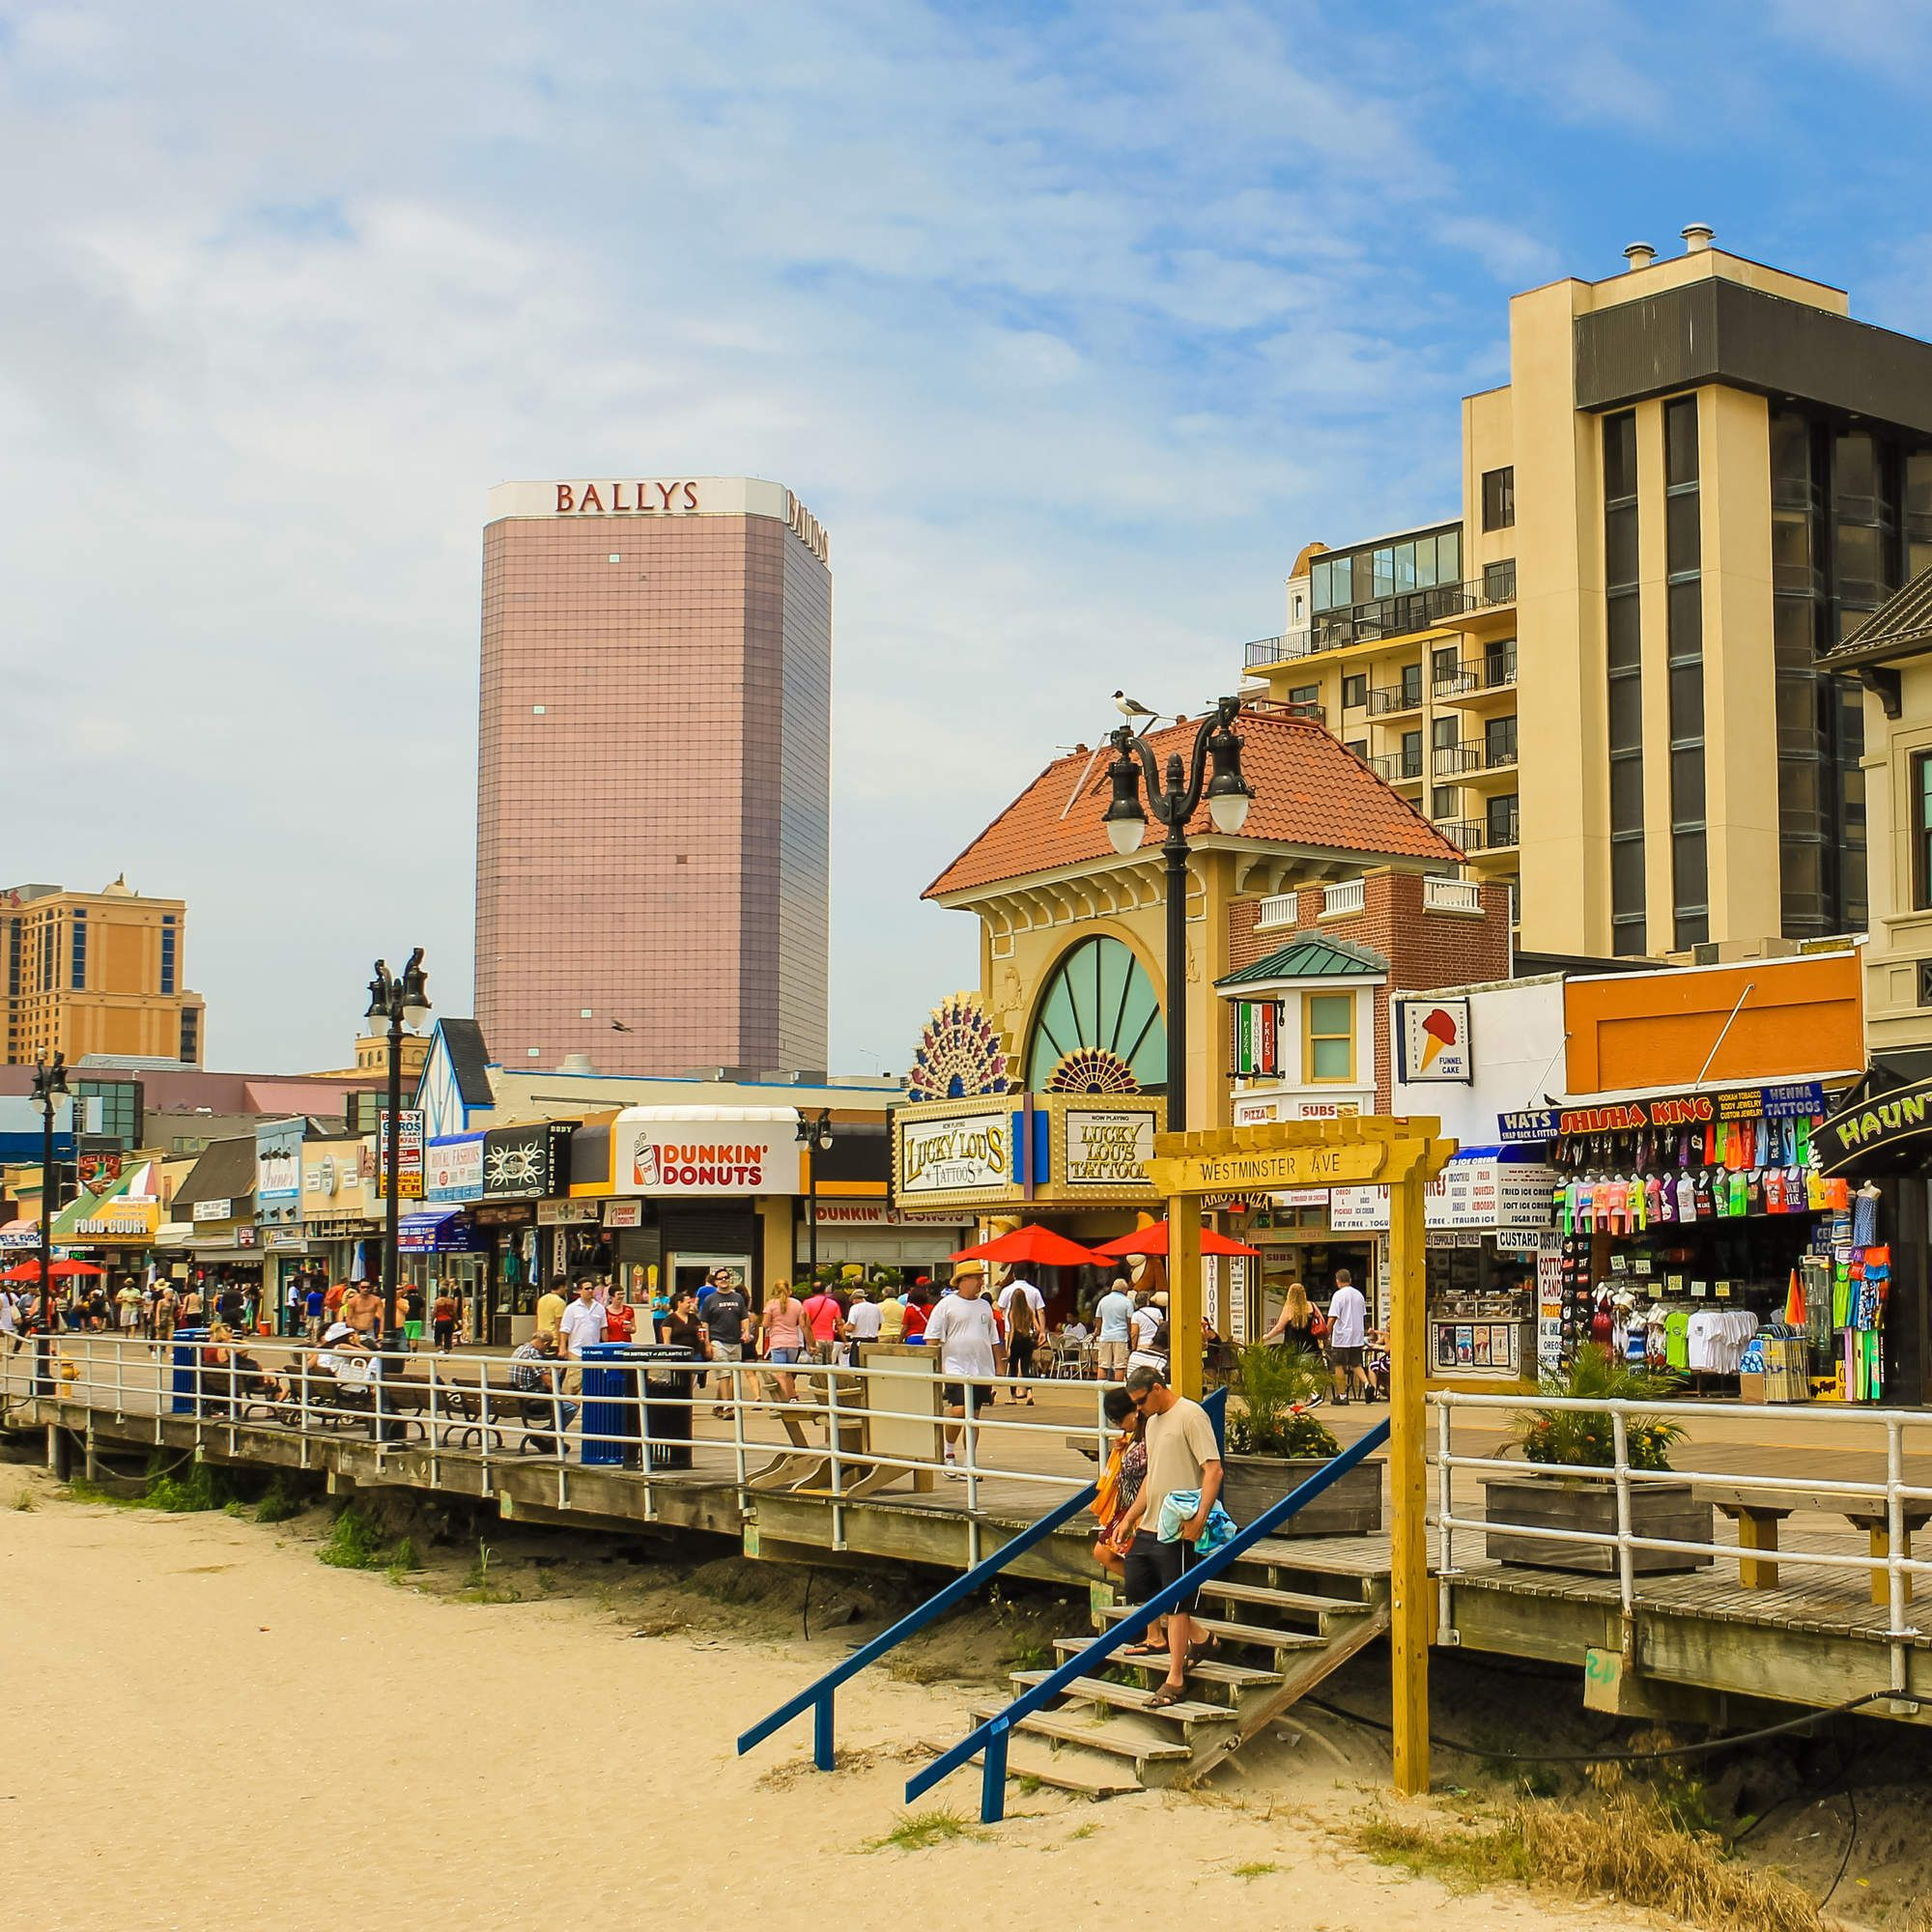 The Best Beaches Near Atlantic City Ocean City Maryland Boardwalk Atlantic City Vacation Ocean City Maryland